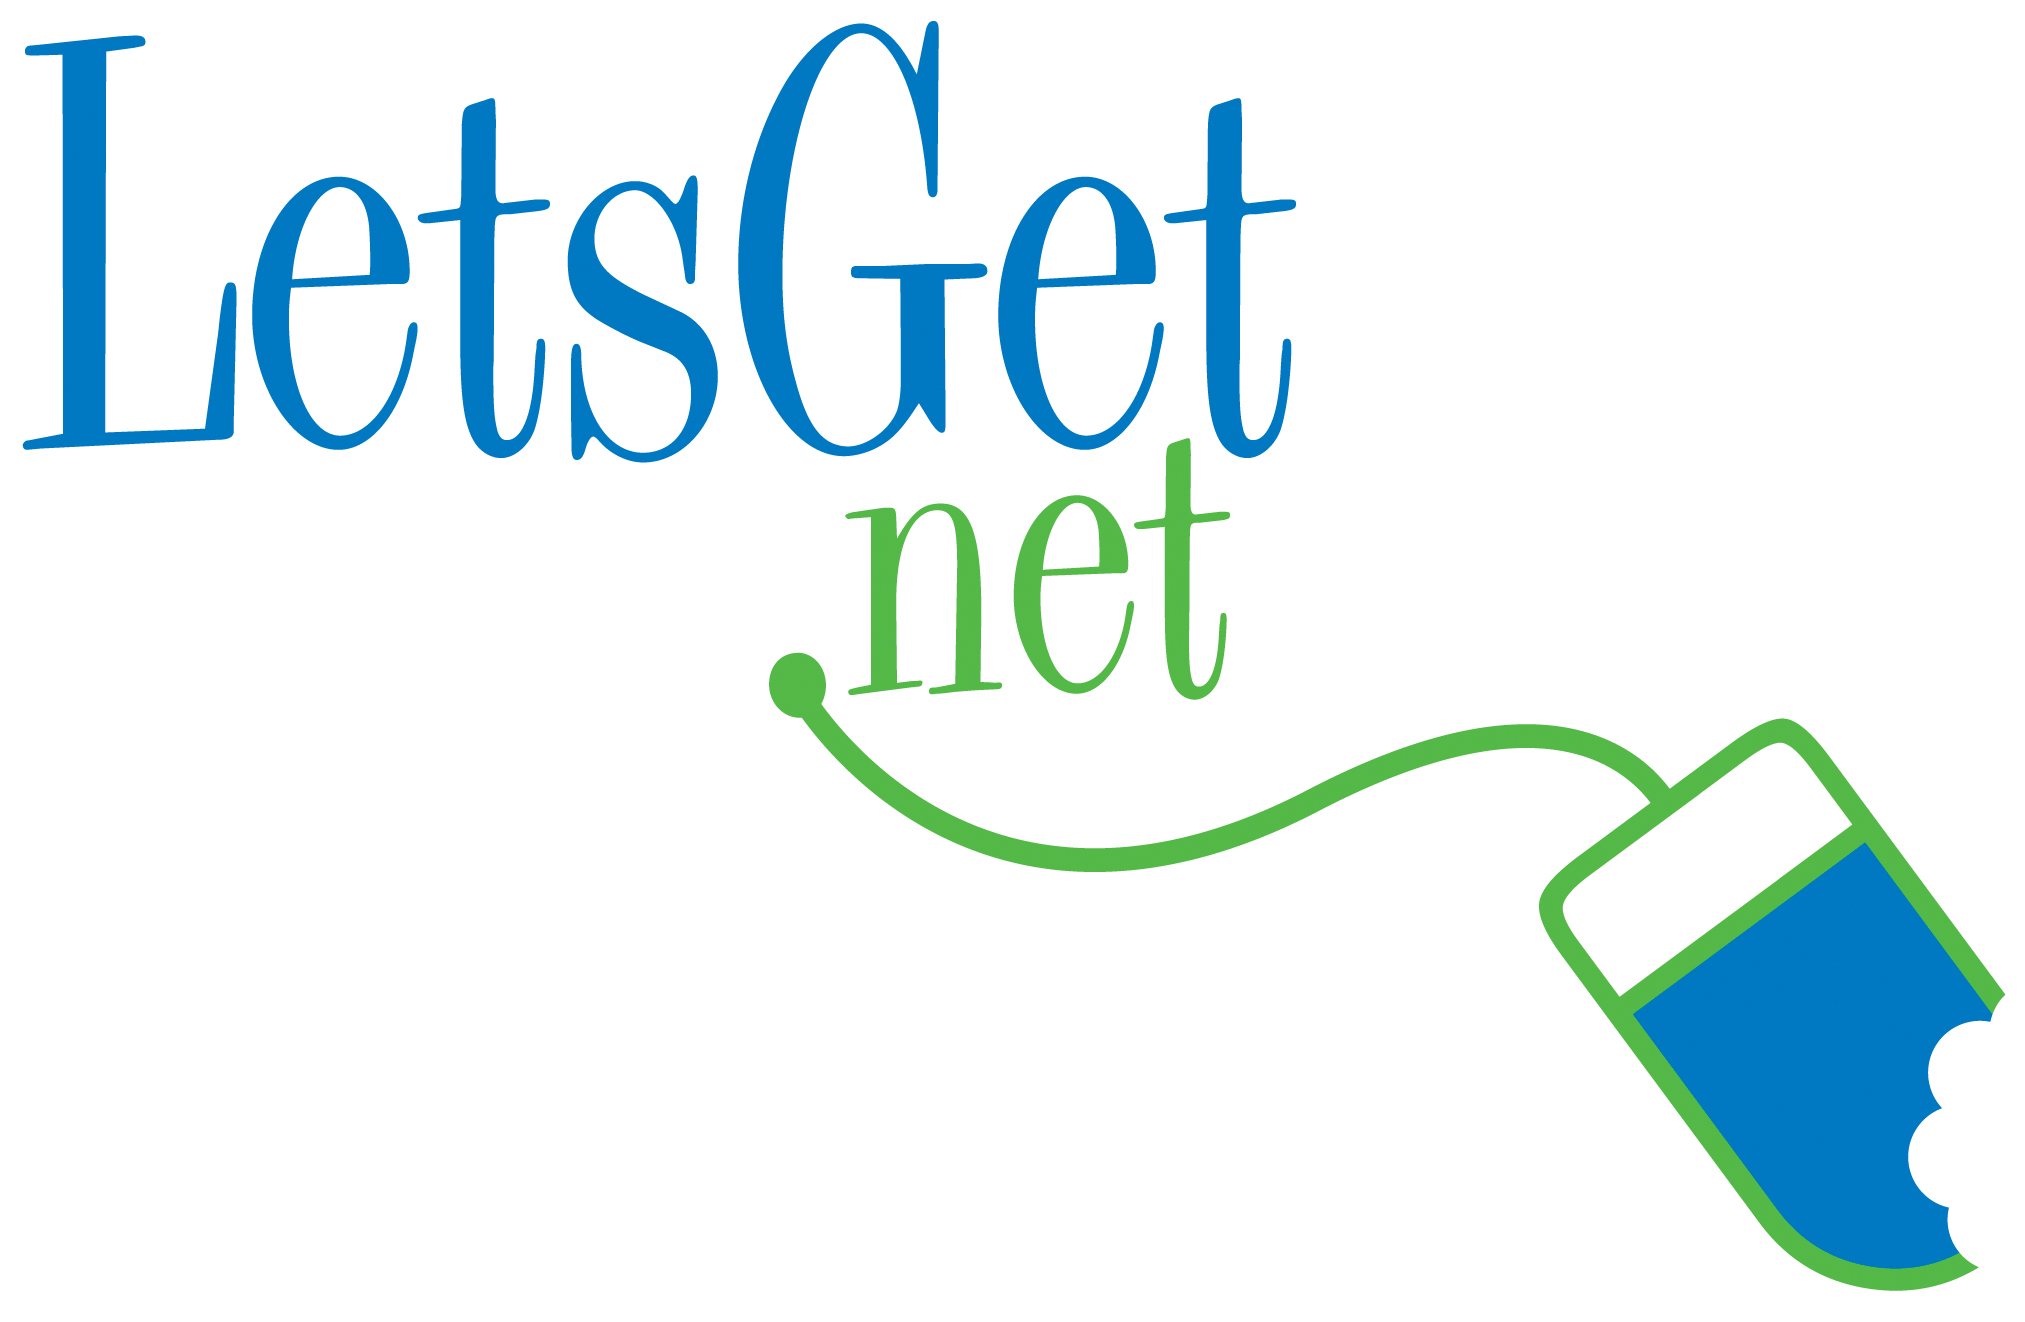 LetsGet Online Ordering